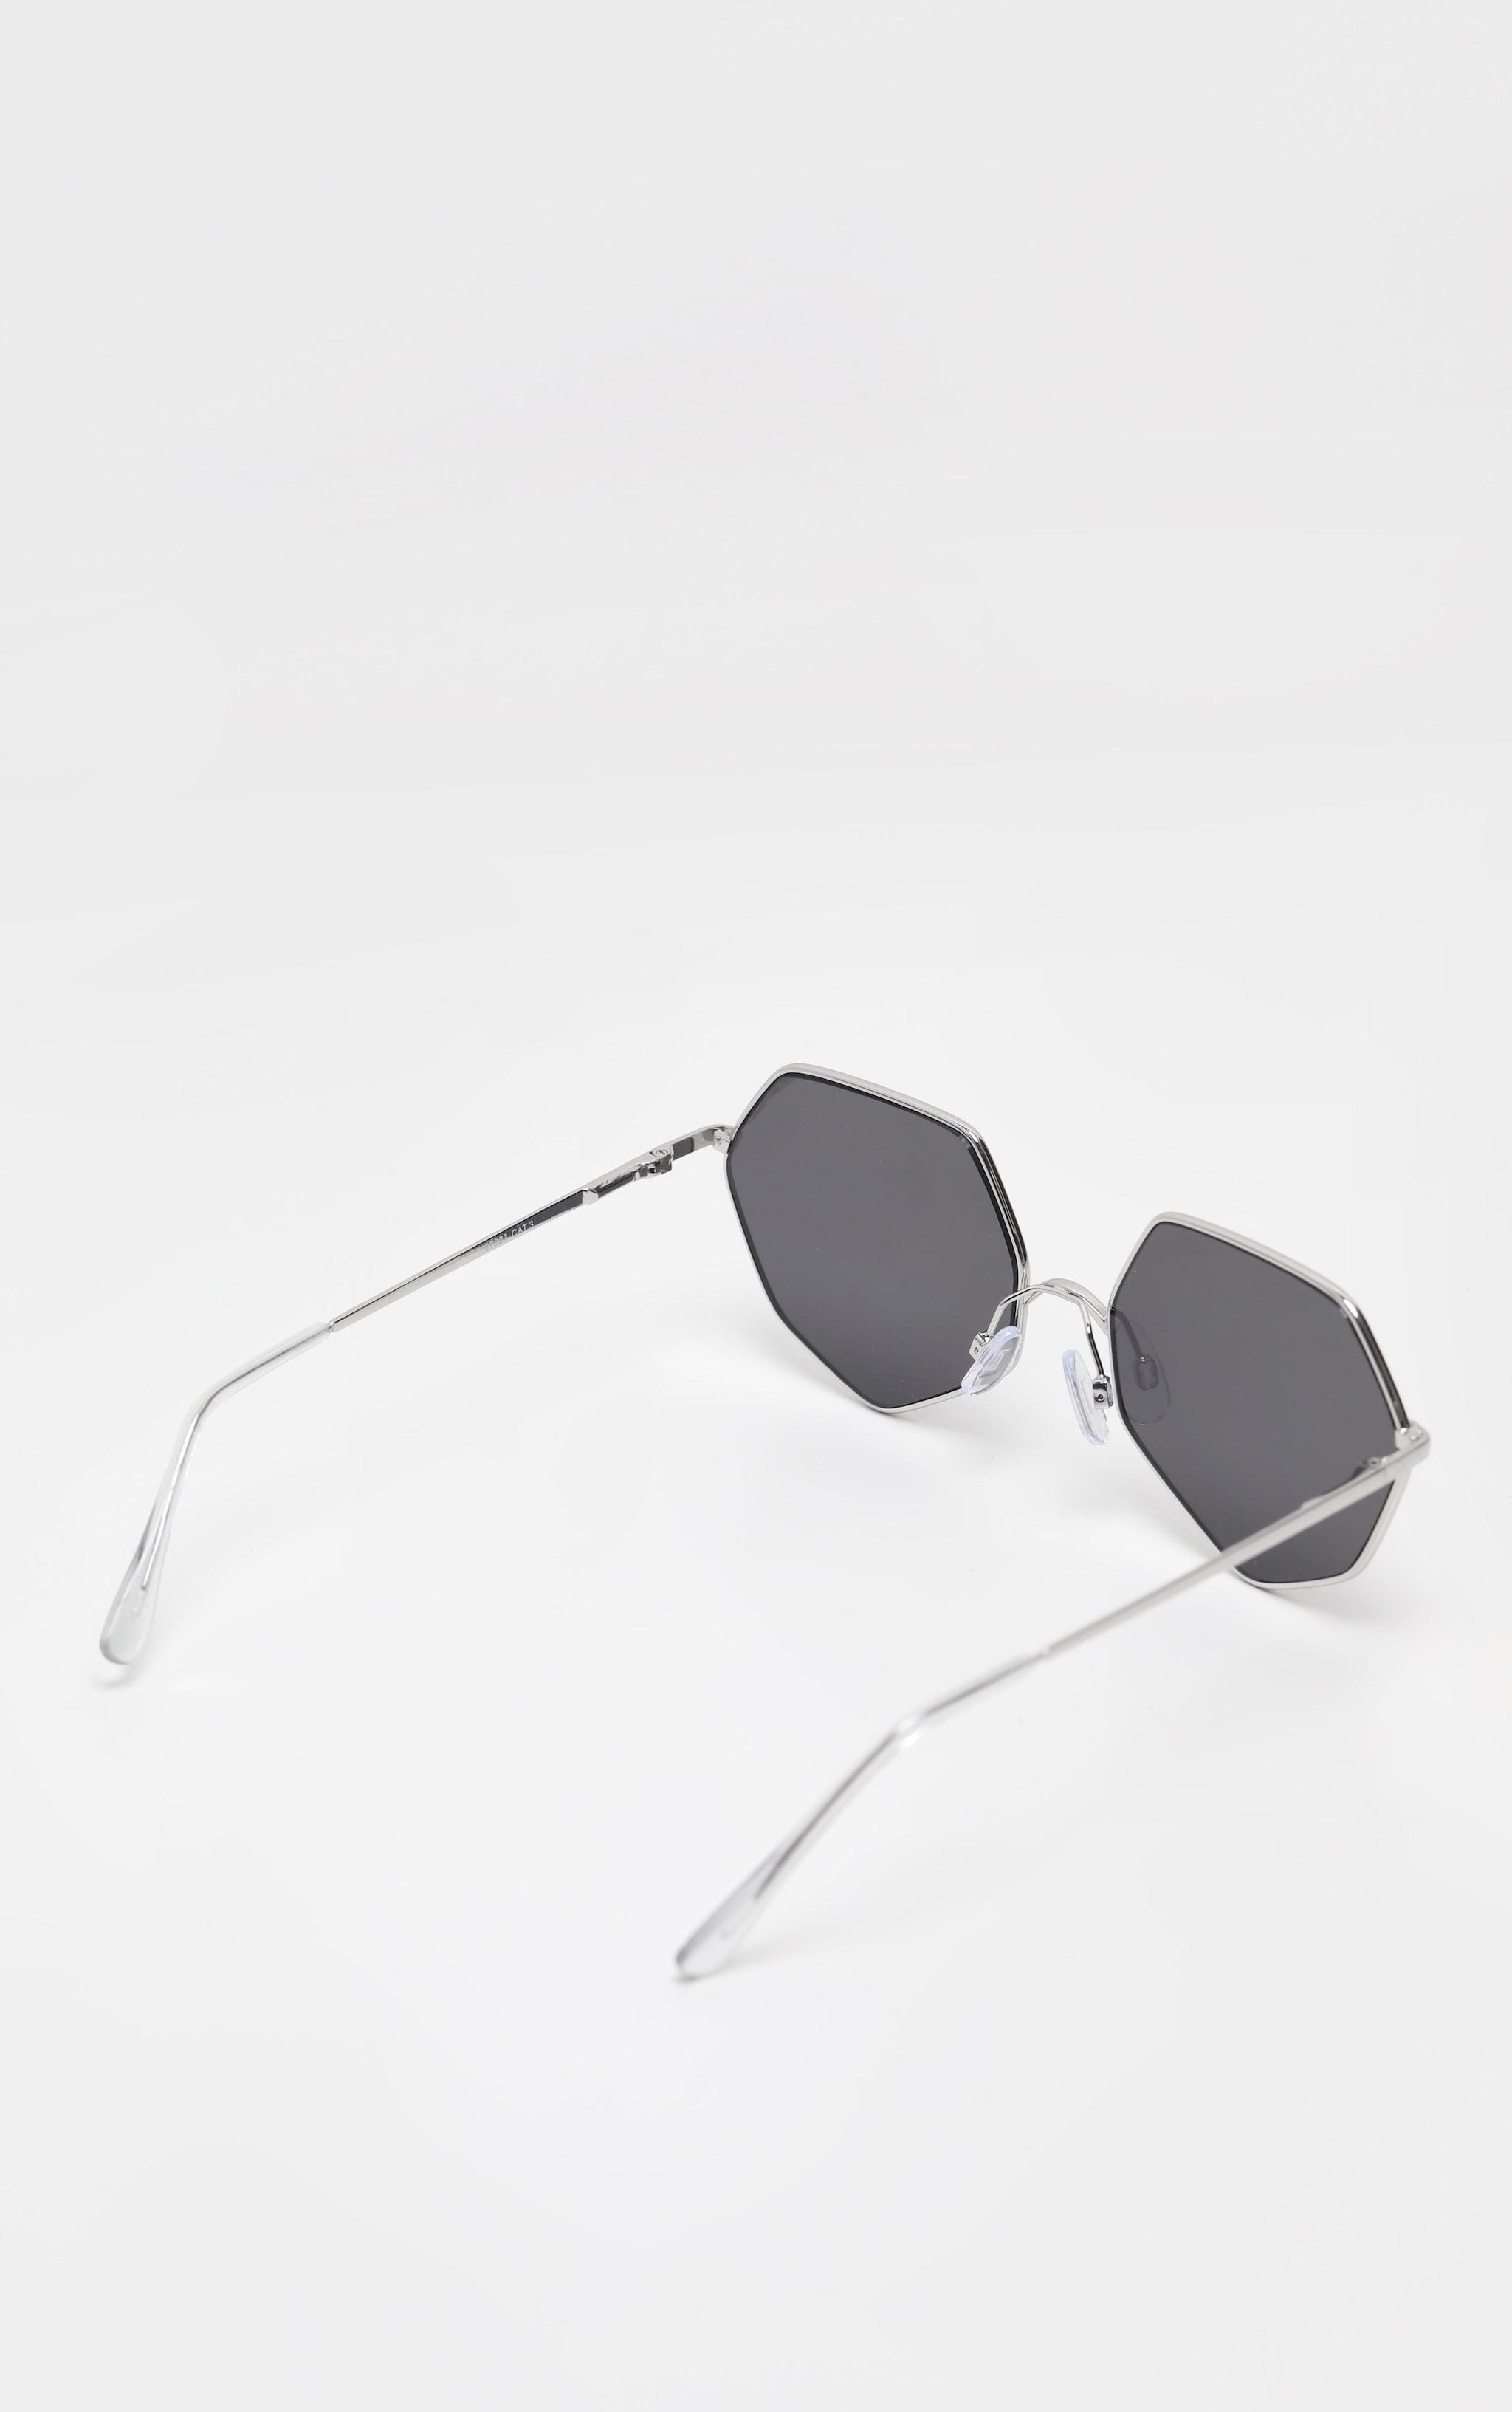 Silver Frame Black Lens Hexagon Sunglasses 3